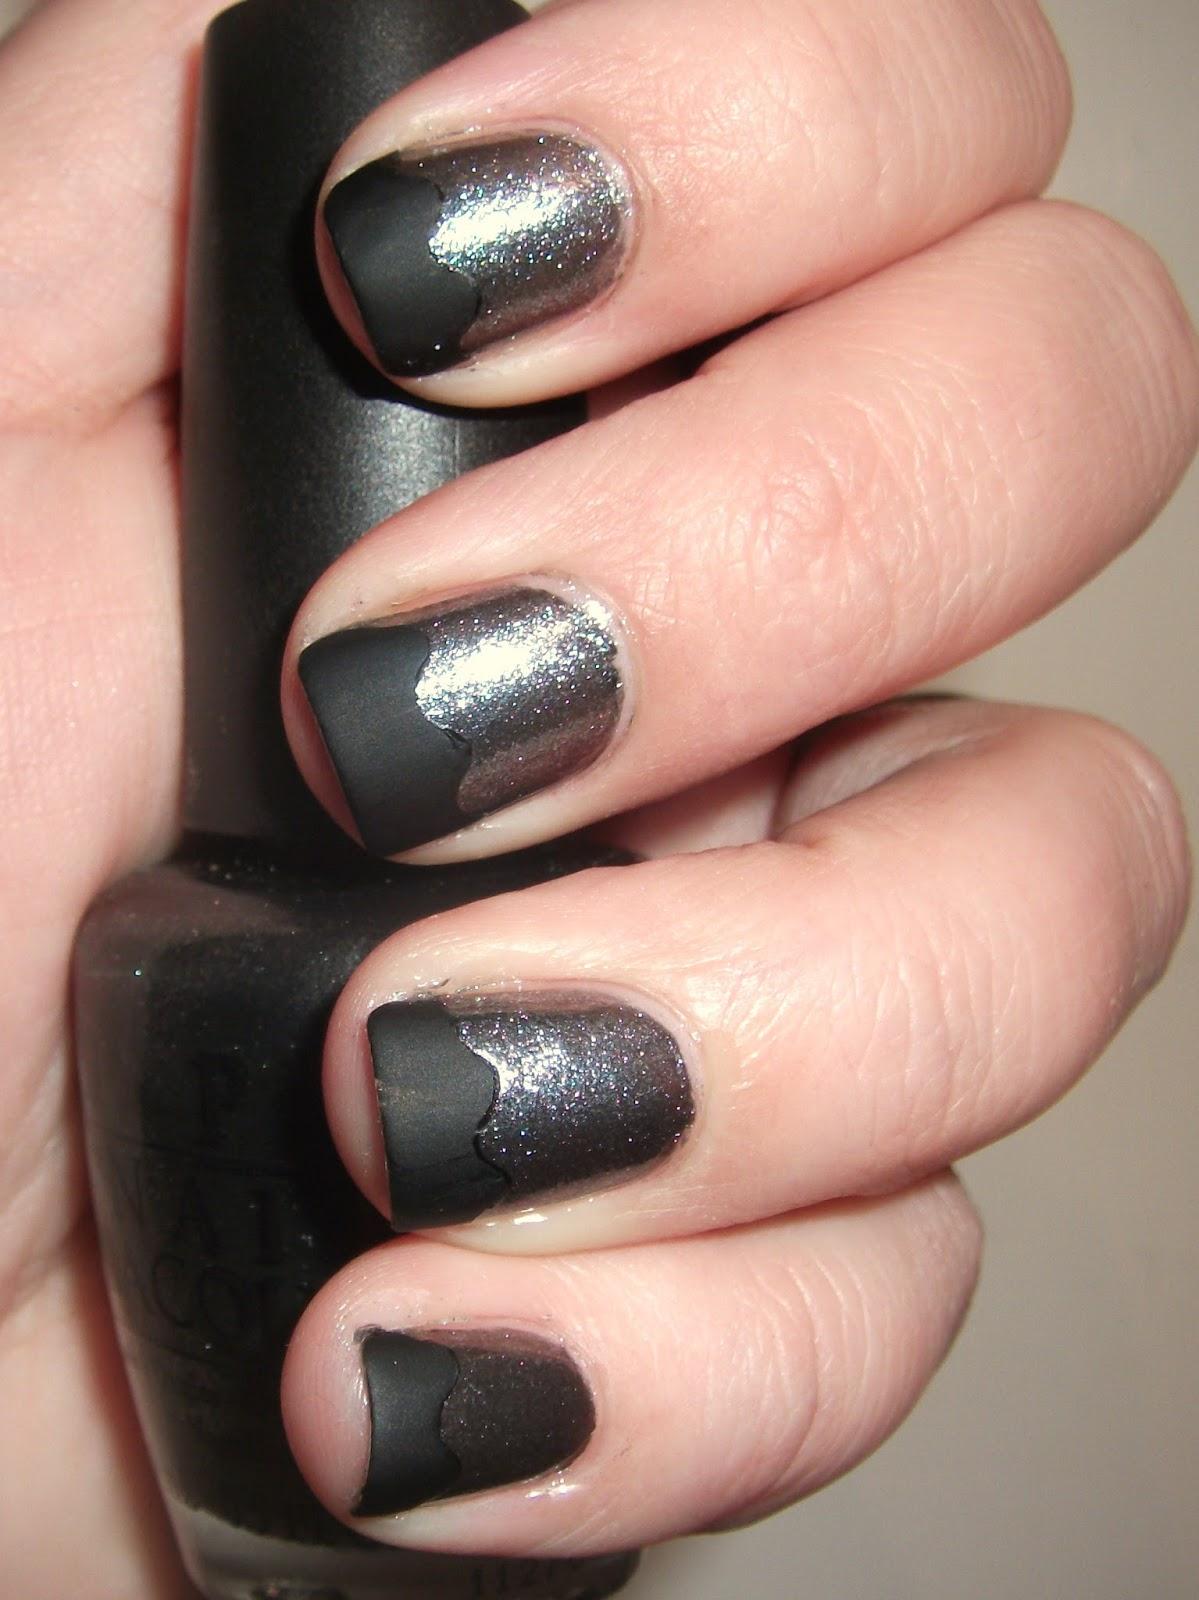 Multi colored toenail polish - 3 4